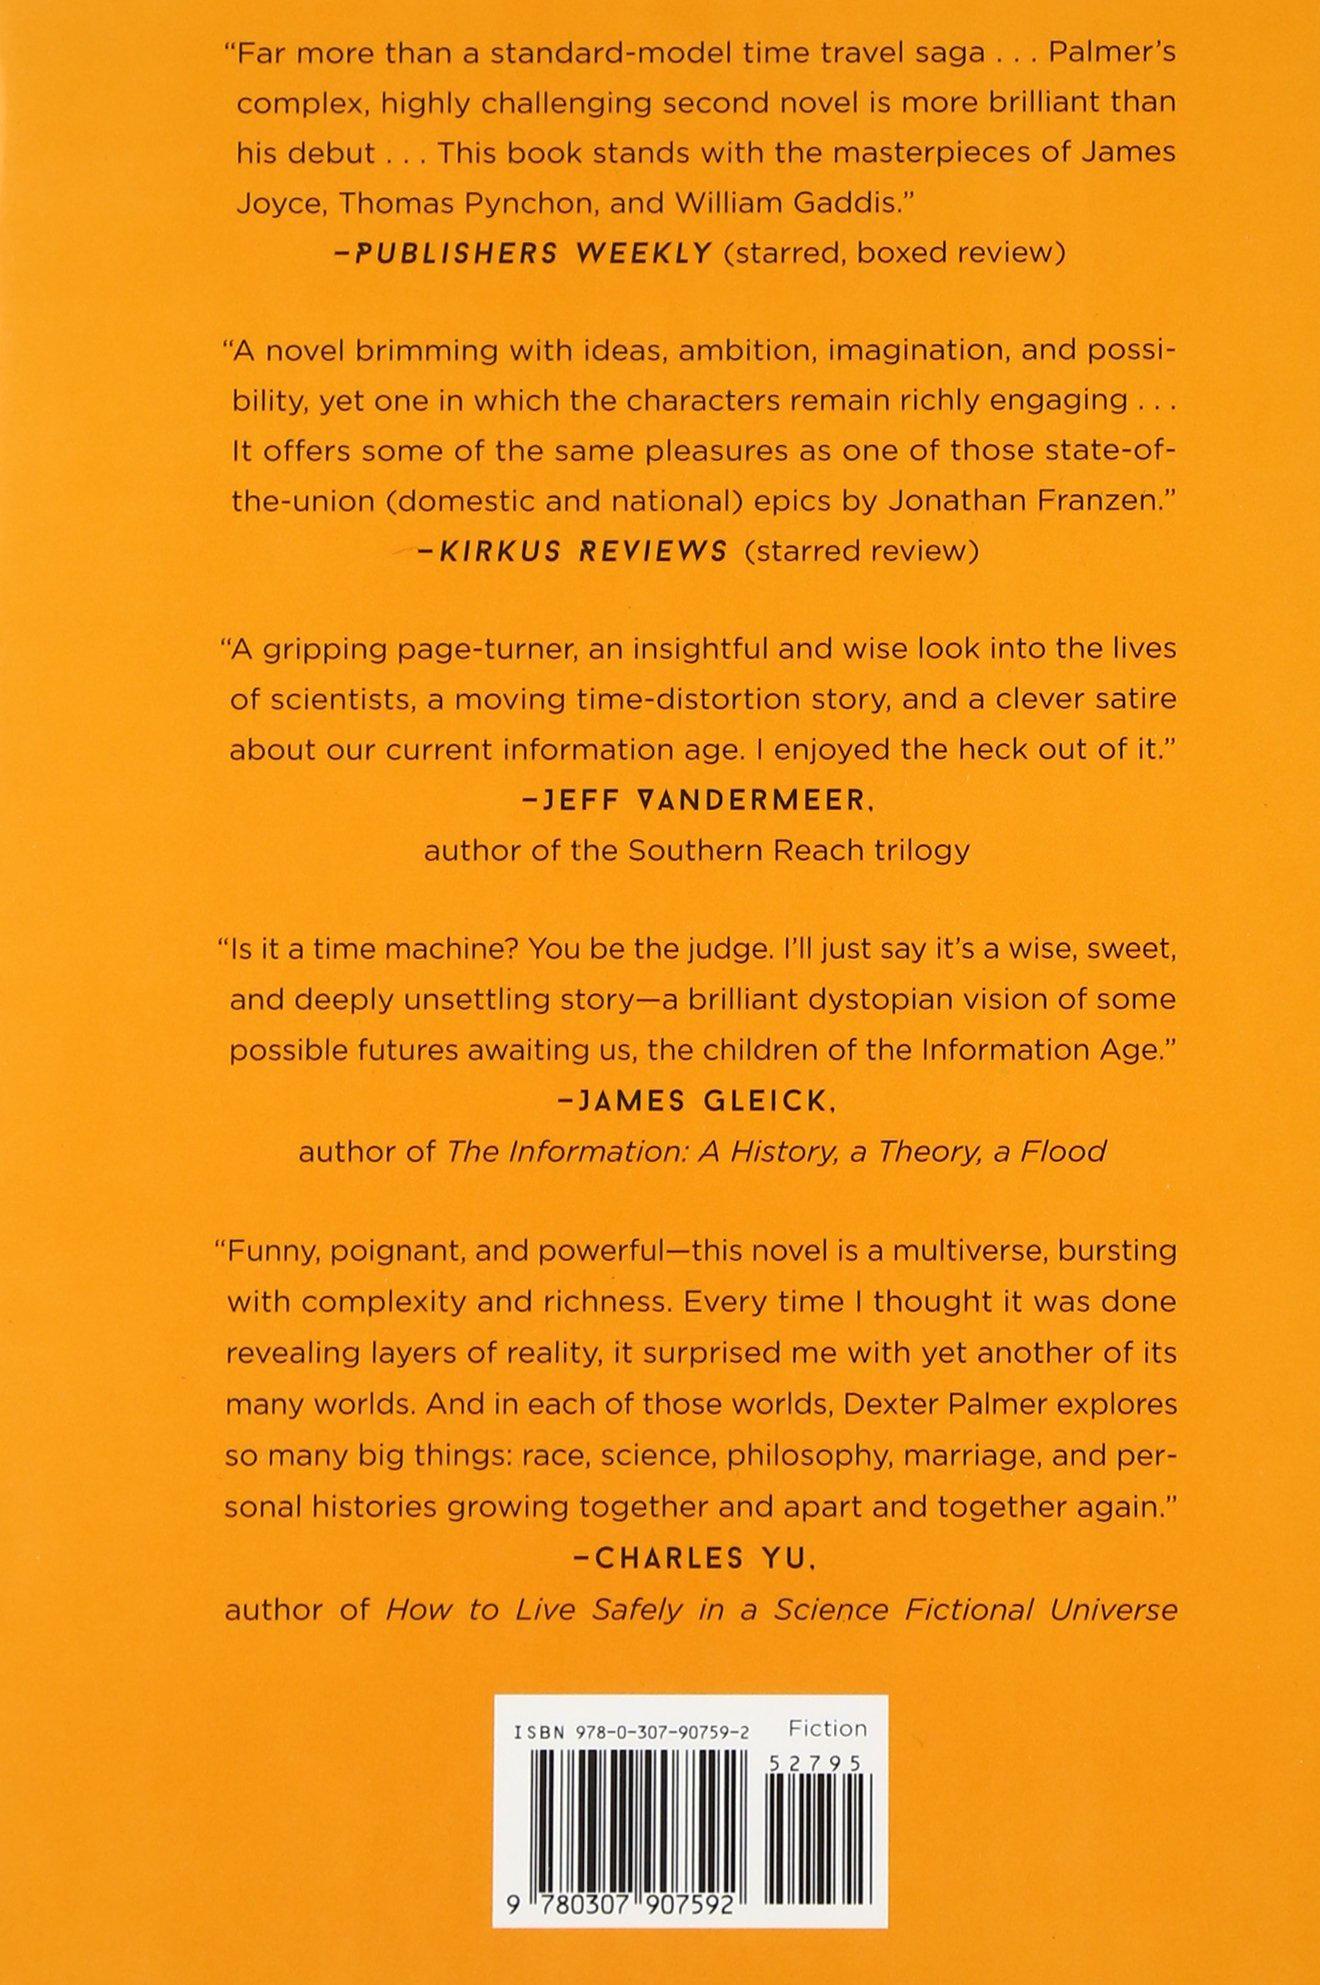 Version Control: A Novel: Dexter Palmer: 9780307907592: Amazon.com: Books